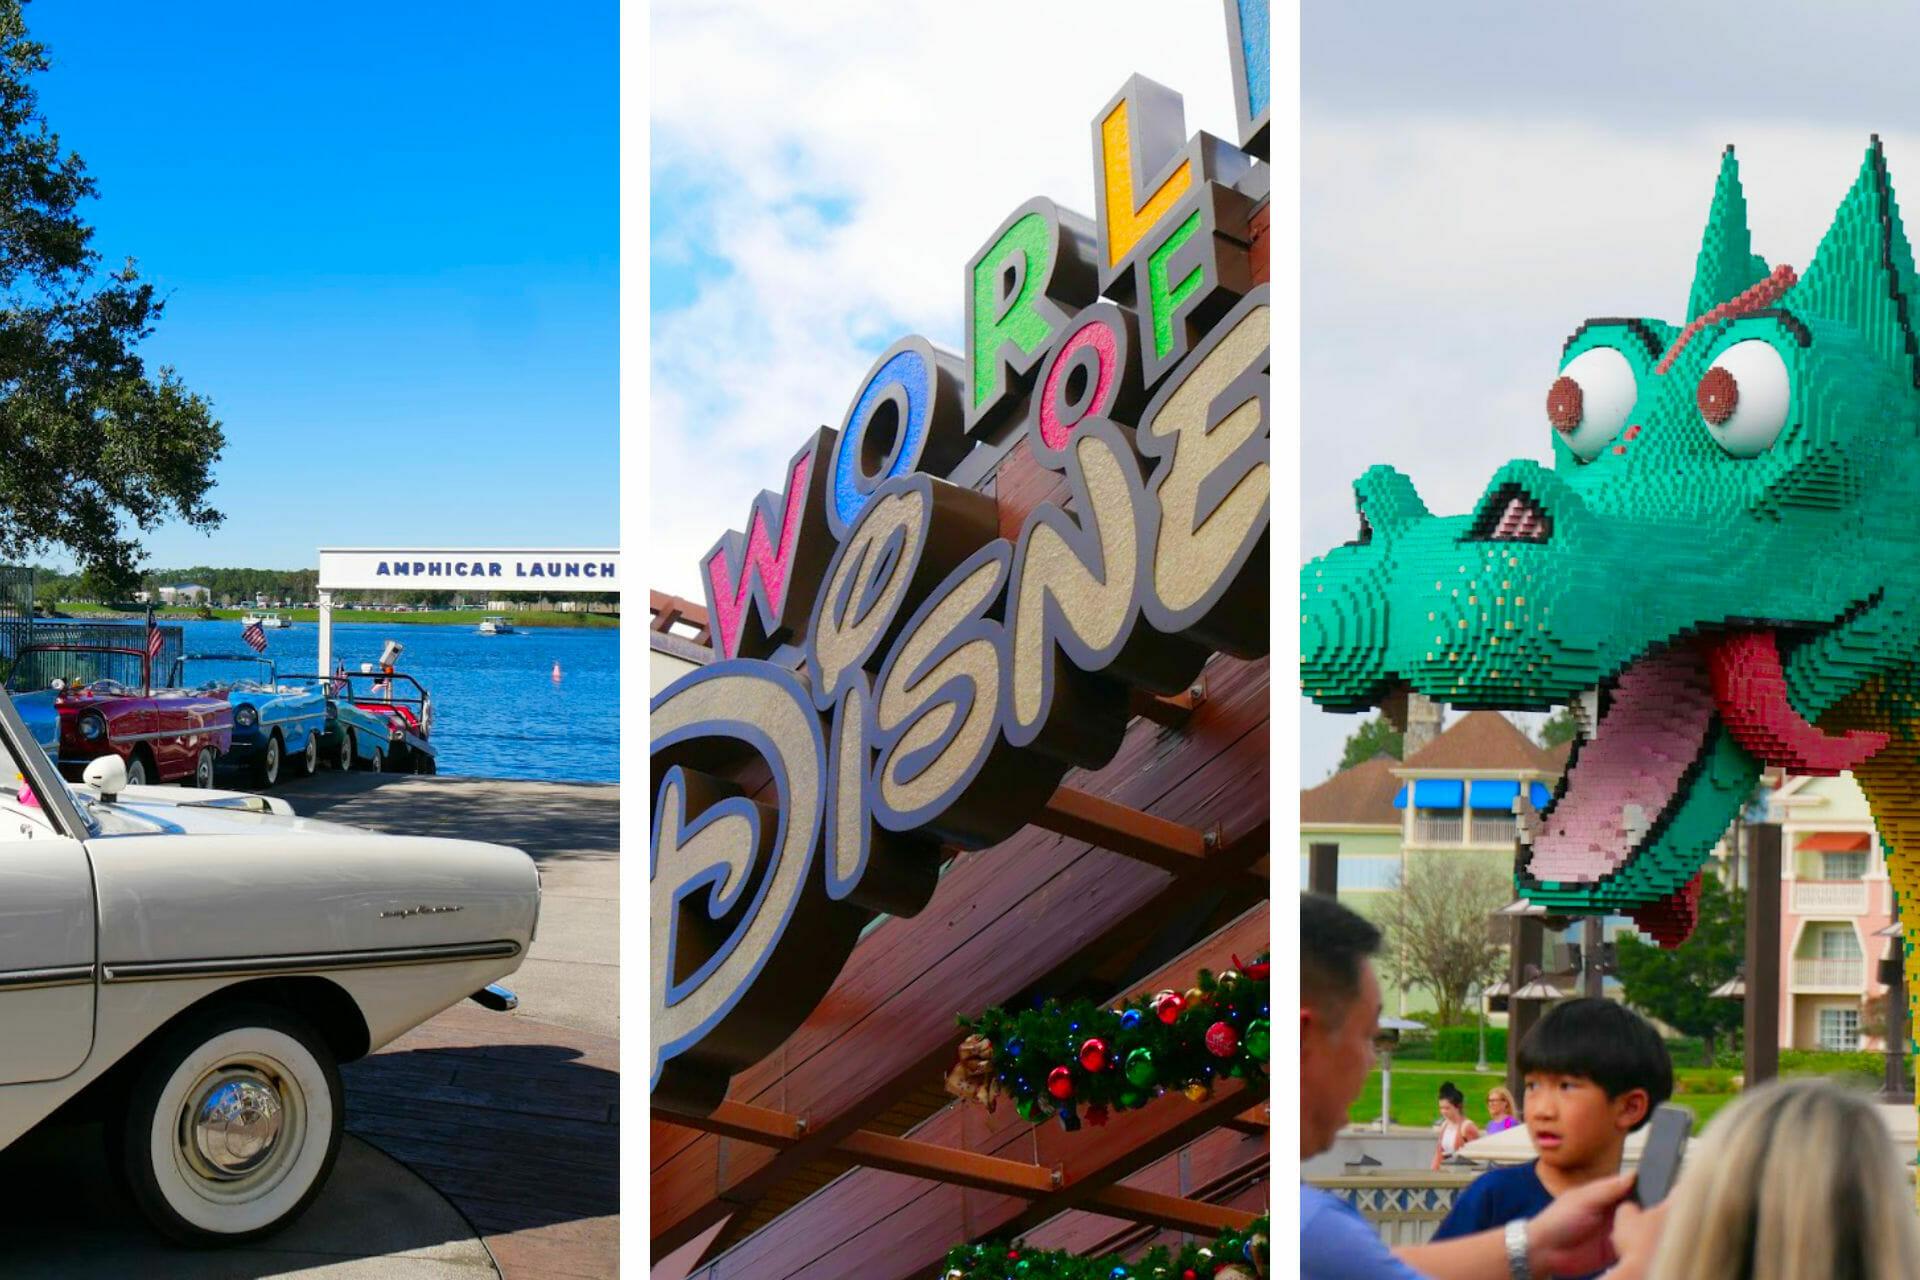 27 Magical Things to Do in Disney Springs at Disney World (2021) via @allamericanatlas